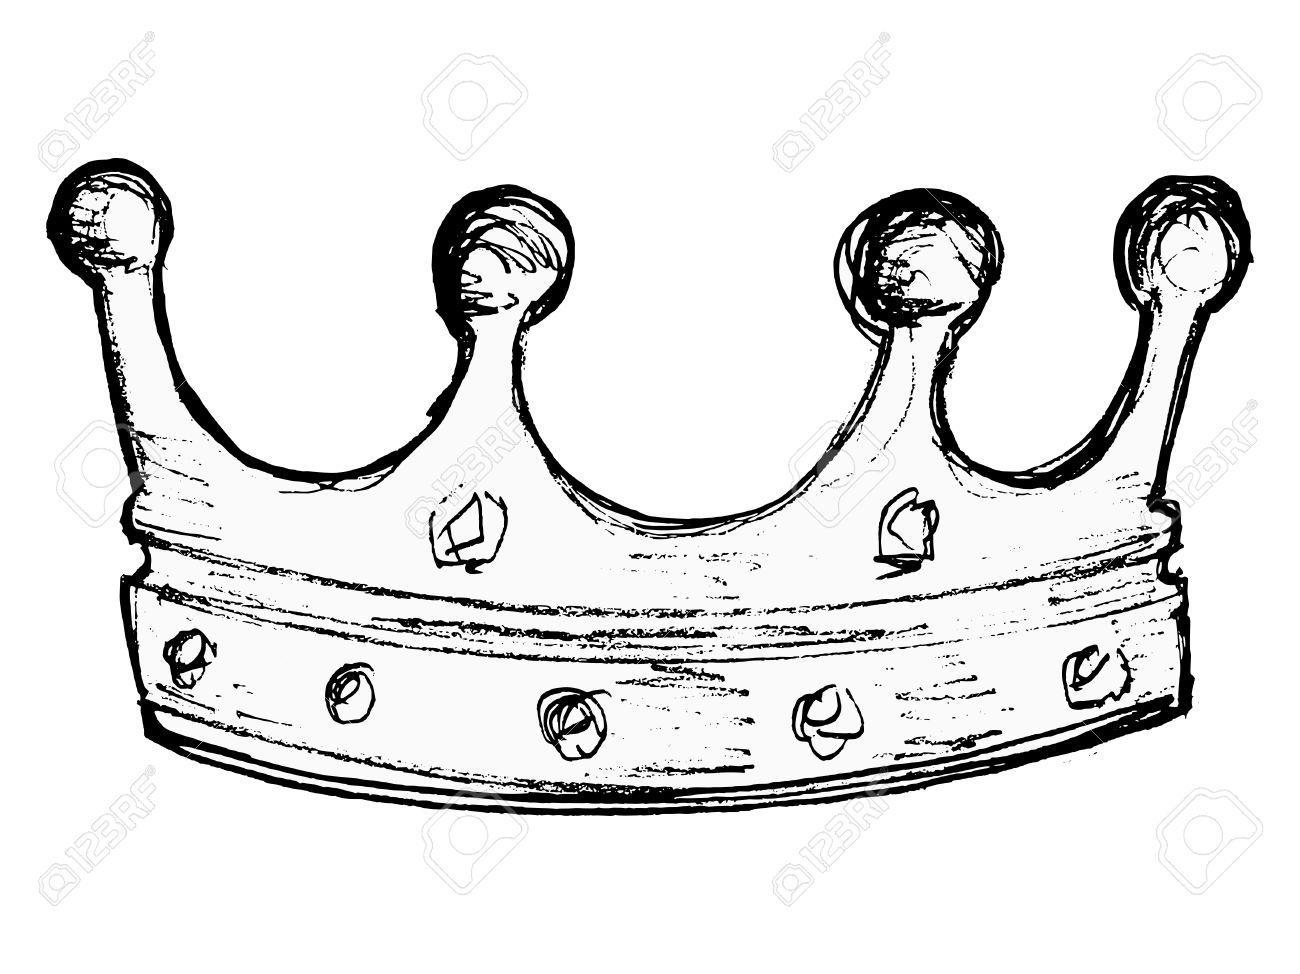 1300x974 Drawn Crown Line Drawing